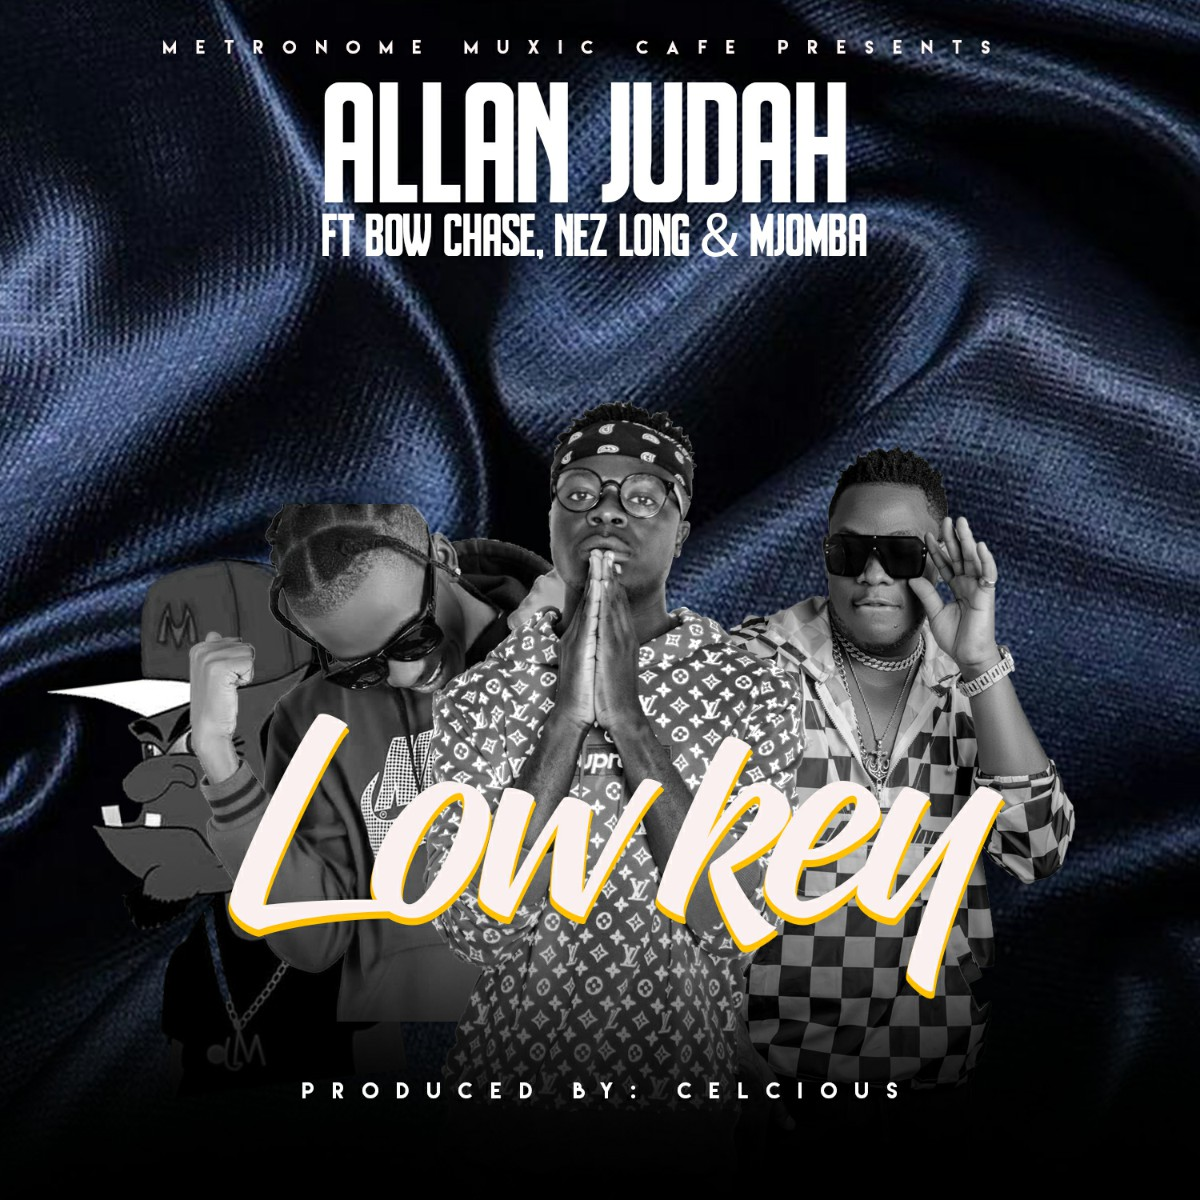 Allan Judah ft. Bow Chase, Nez Long & Mjomba - Low Key